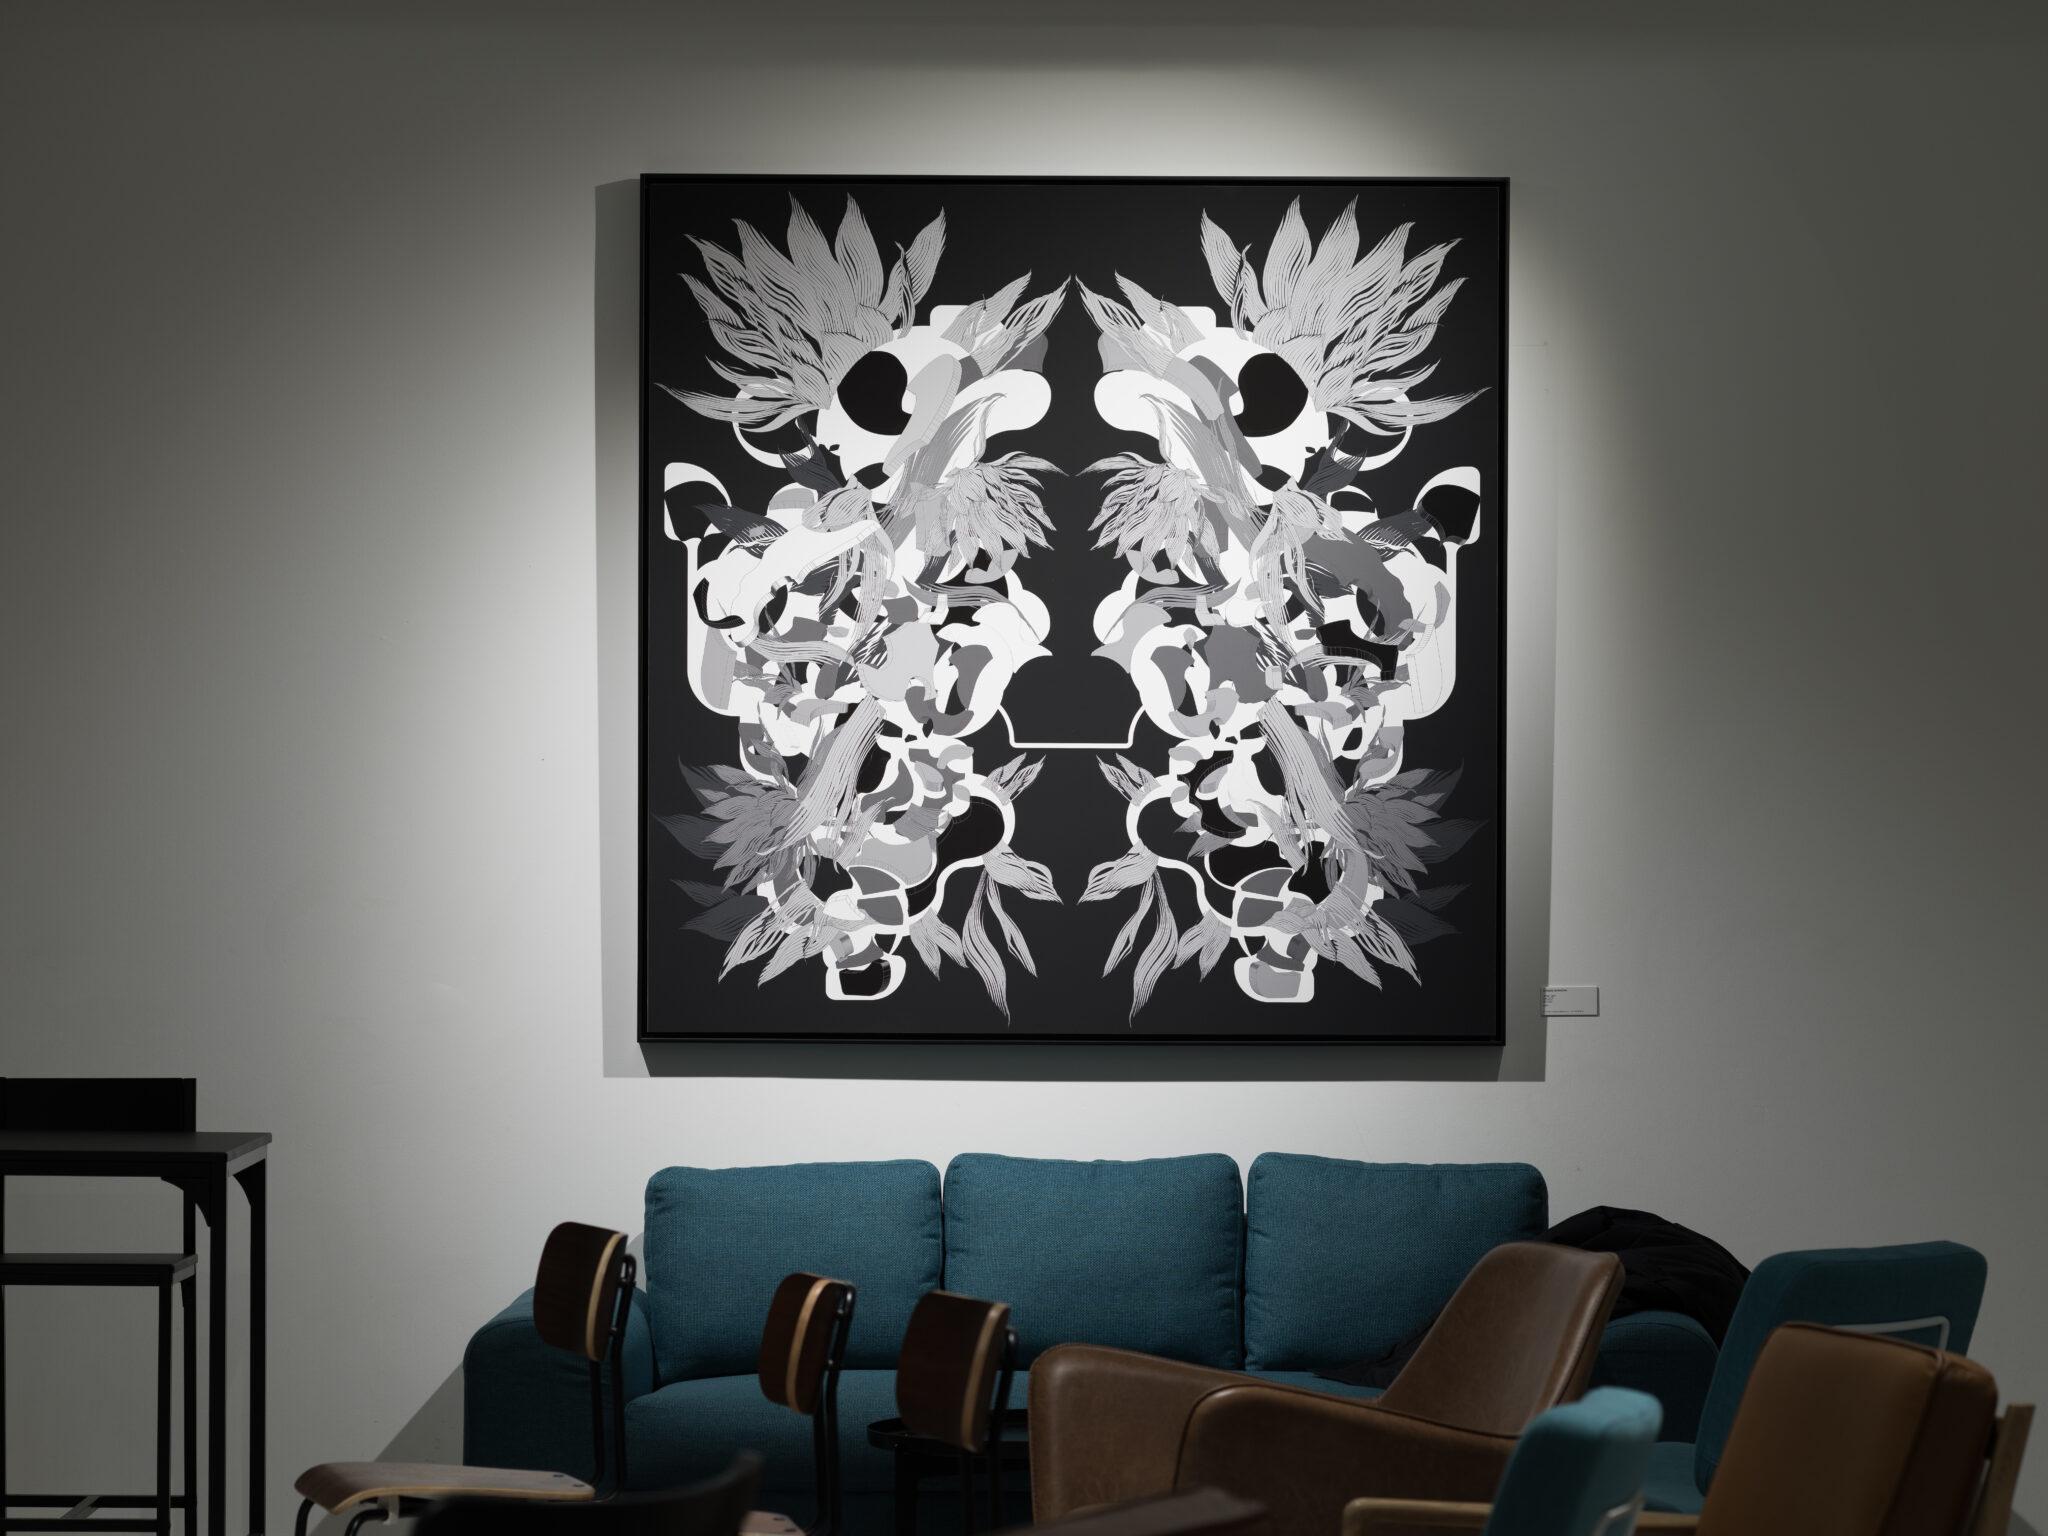 audrey-hatchikian-gallery-flagrant-délire-sacha-haillote-rodolphe-barsikian-expo-contemporary-art